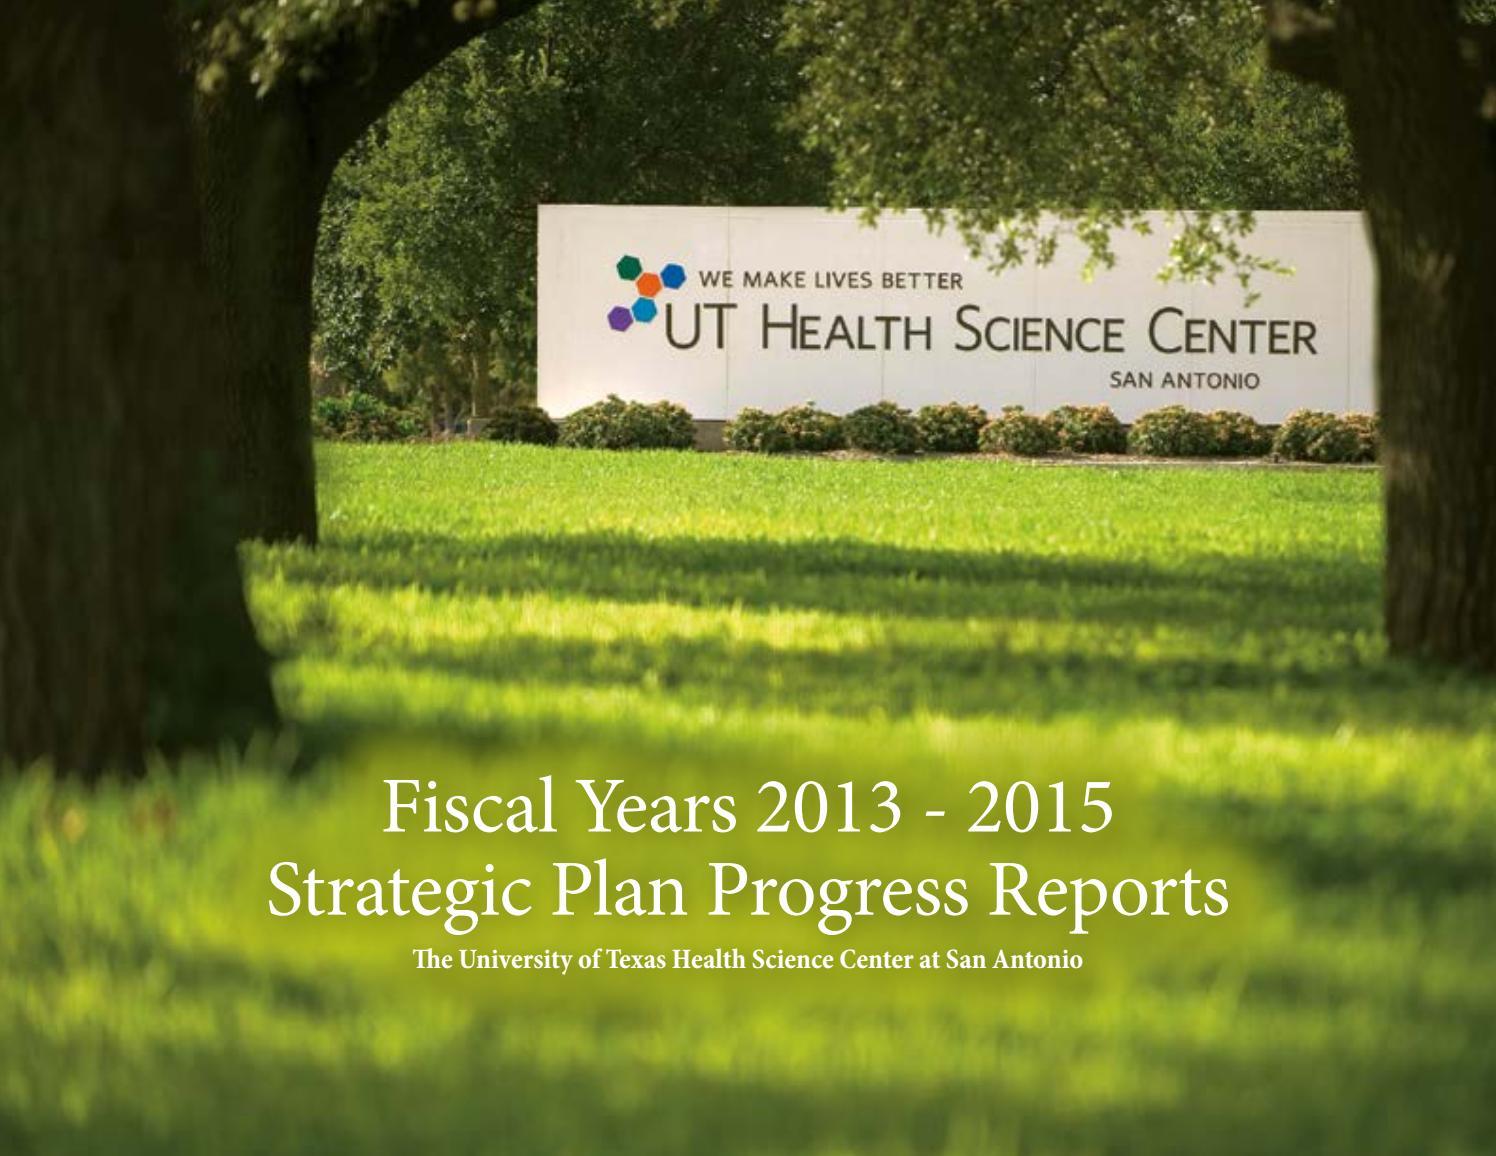 Strategic Plan Progress Report FY13-15 by UT Health San